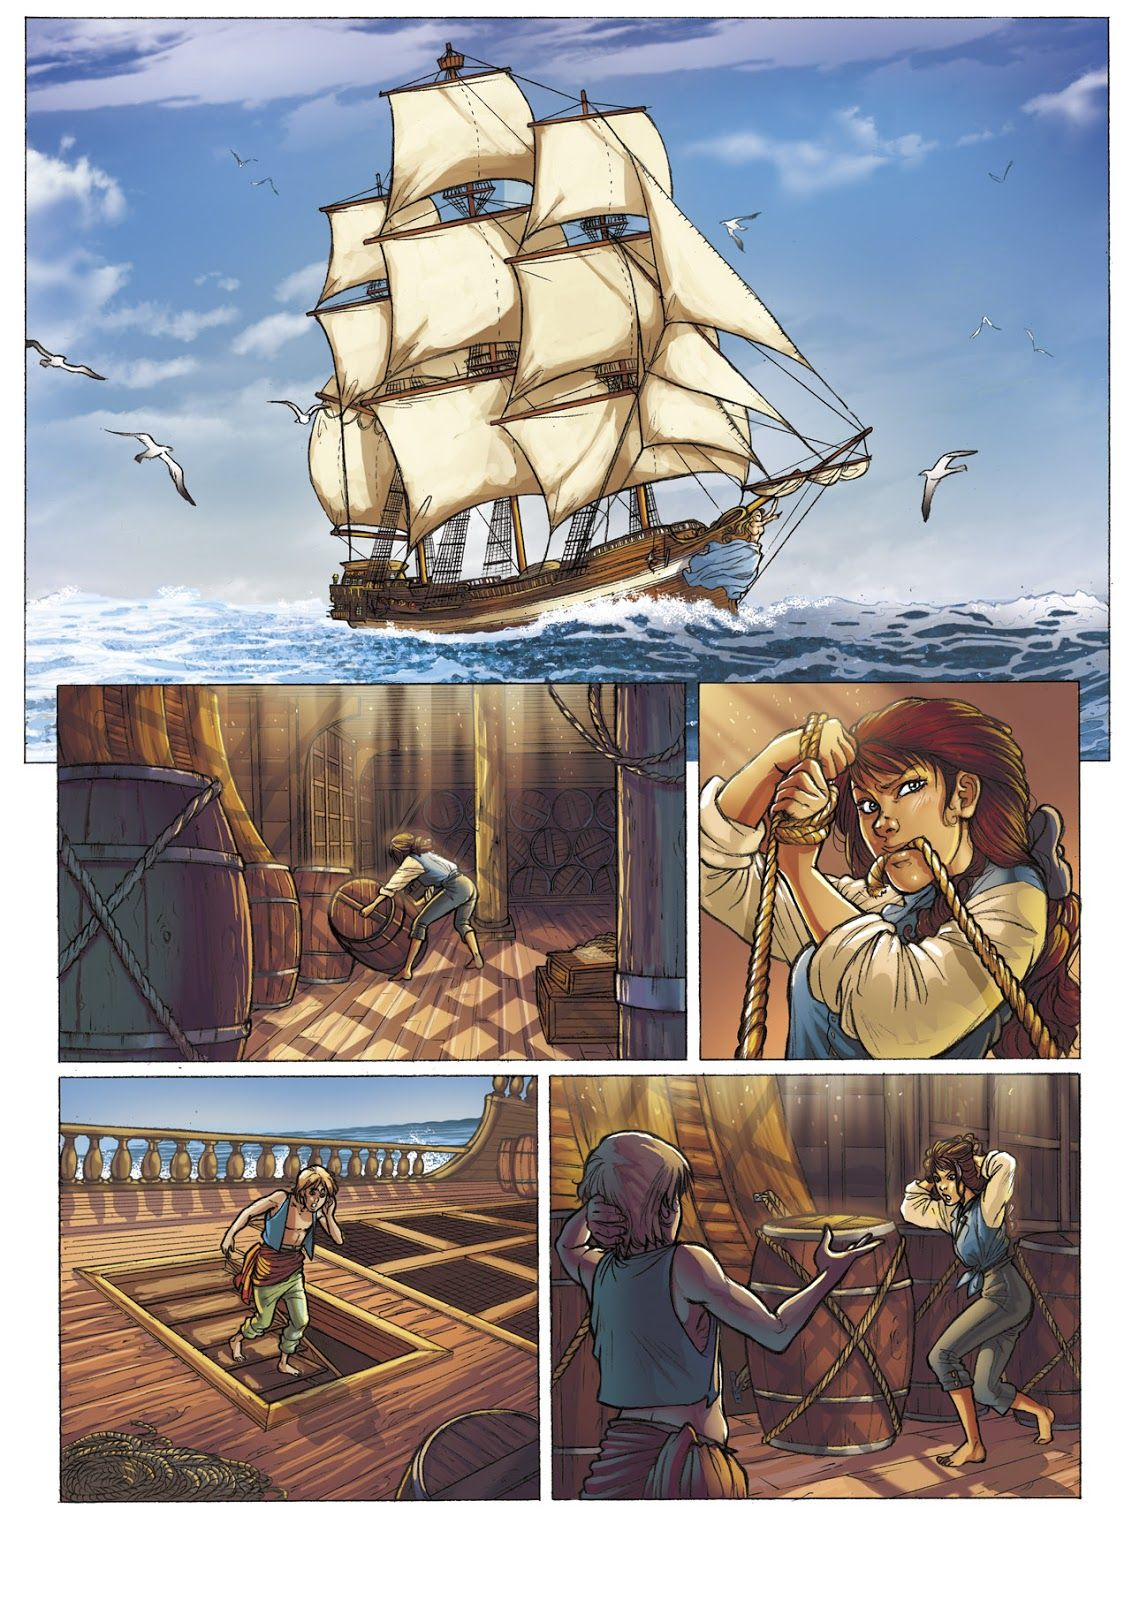 Les Aventurier De La Mer : aventurier, Daniela, Matteo, 'Dimat', Aventuriers, Robin, Hobb,, Grounds,, Comics